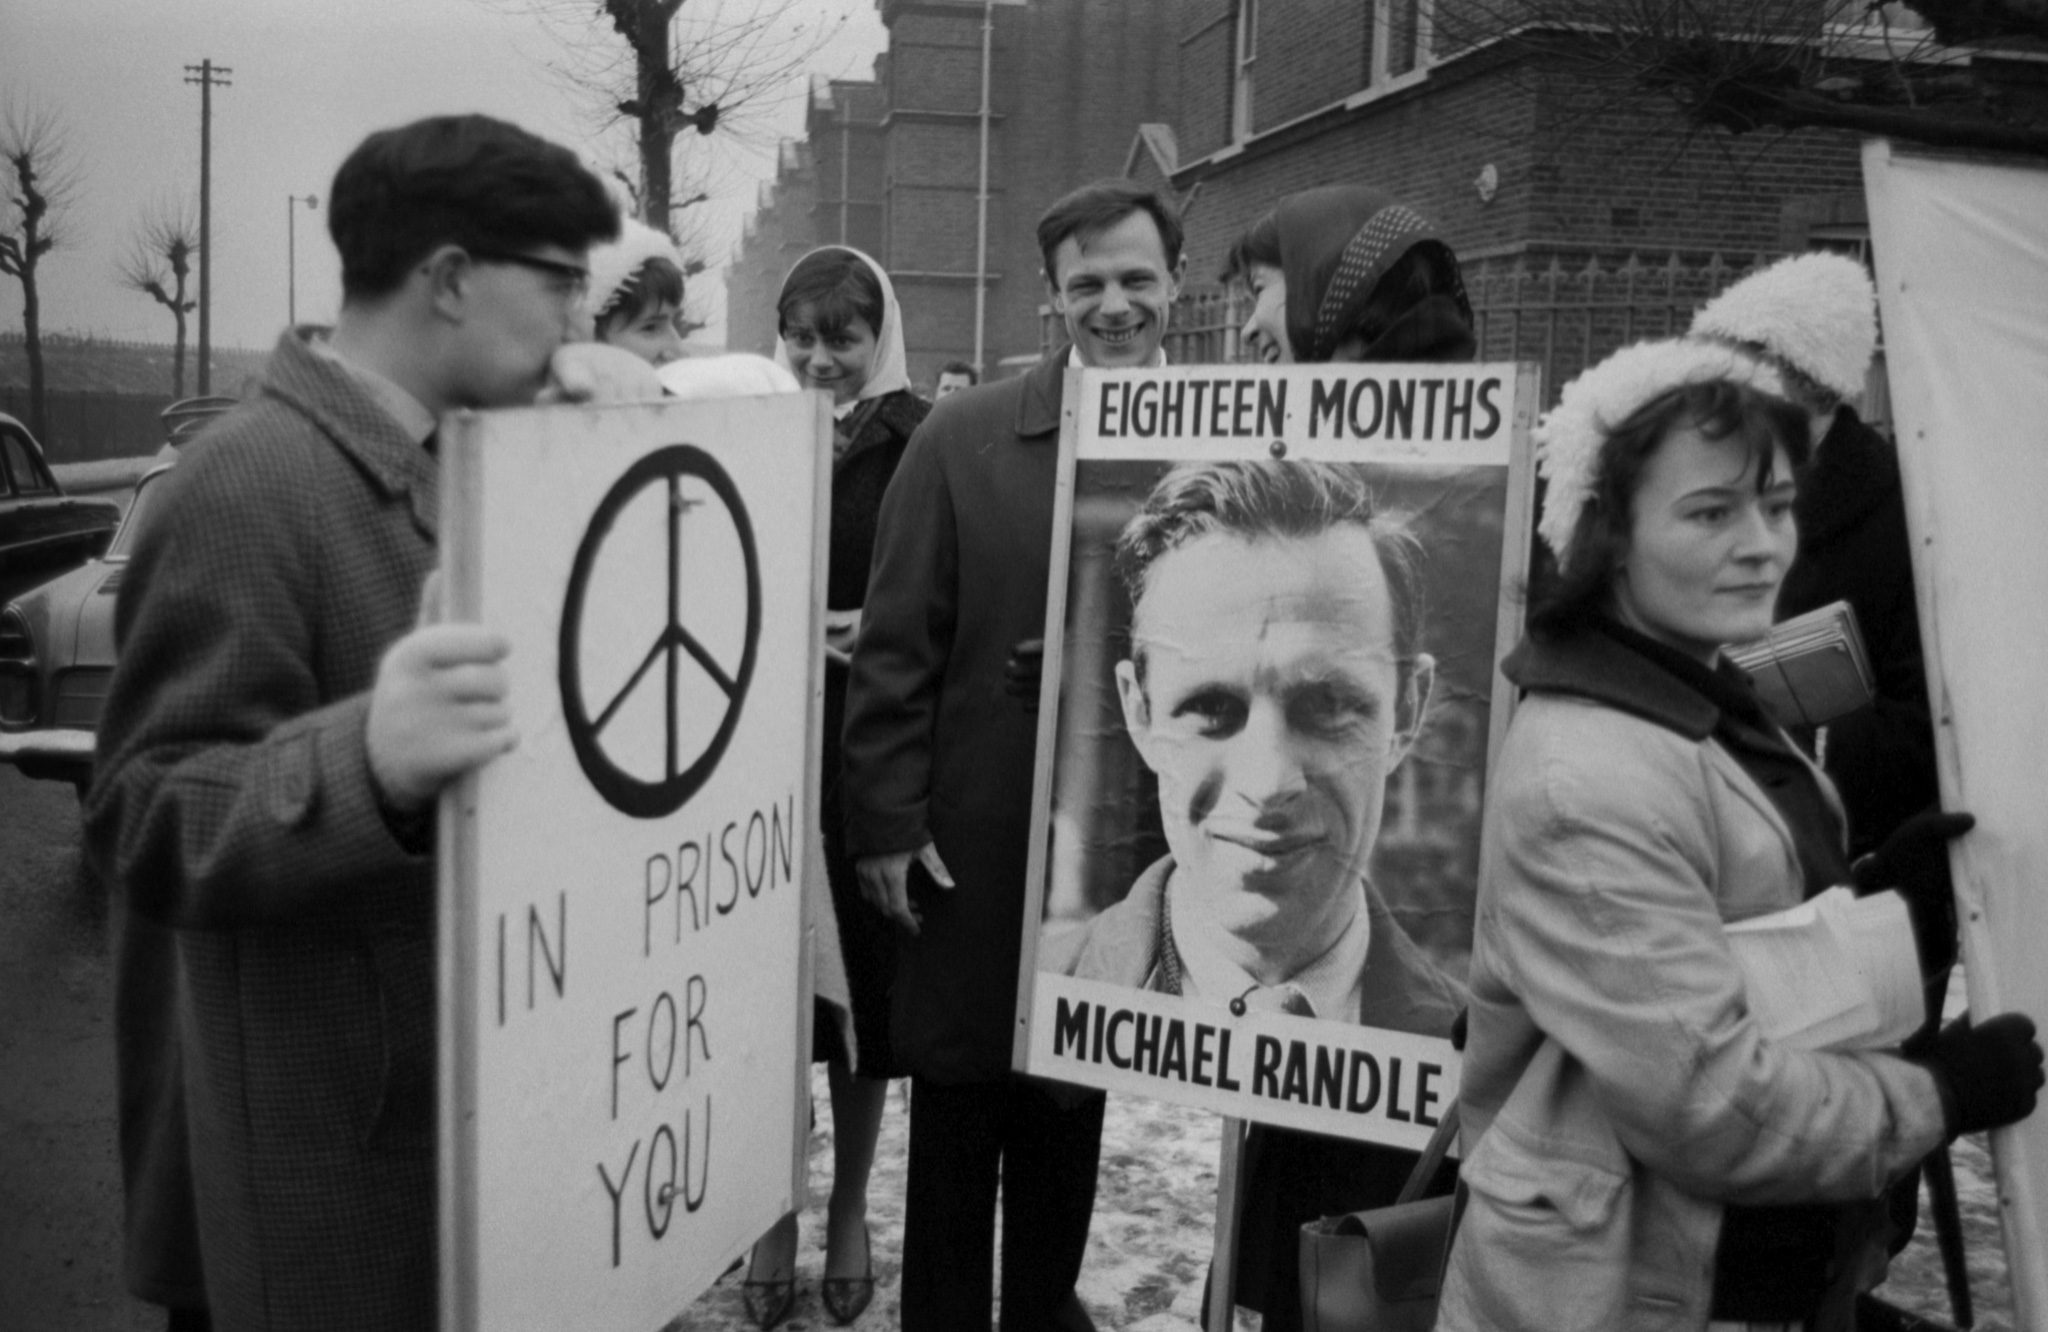 Dr. Michael Randle leaves Wormwood Scrubs